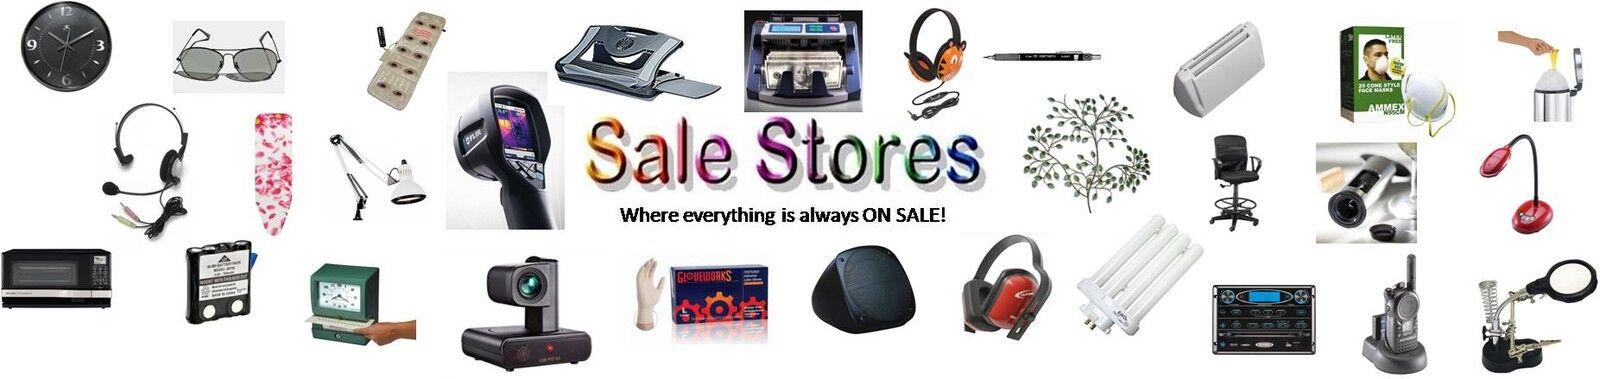 Sale Stores 2